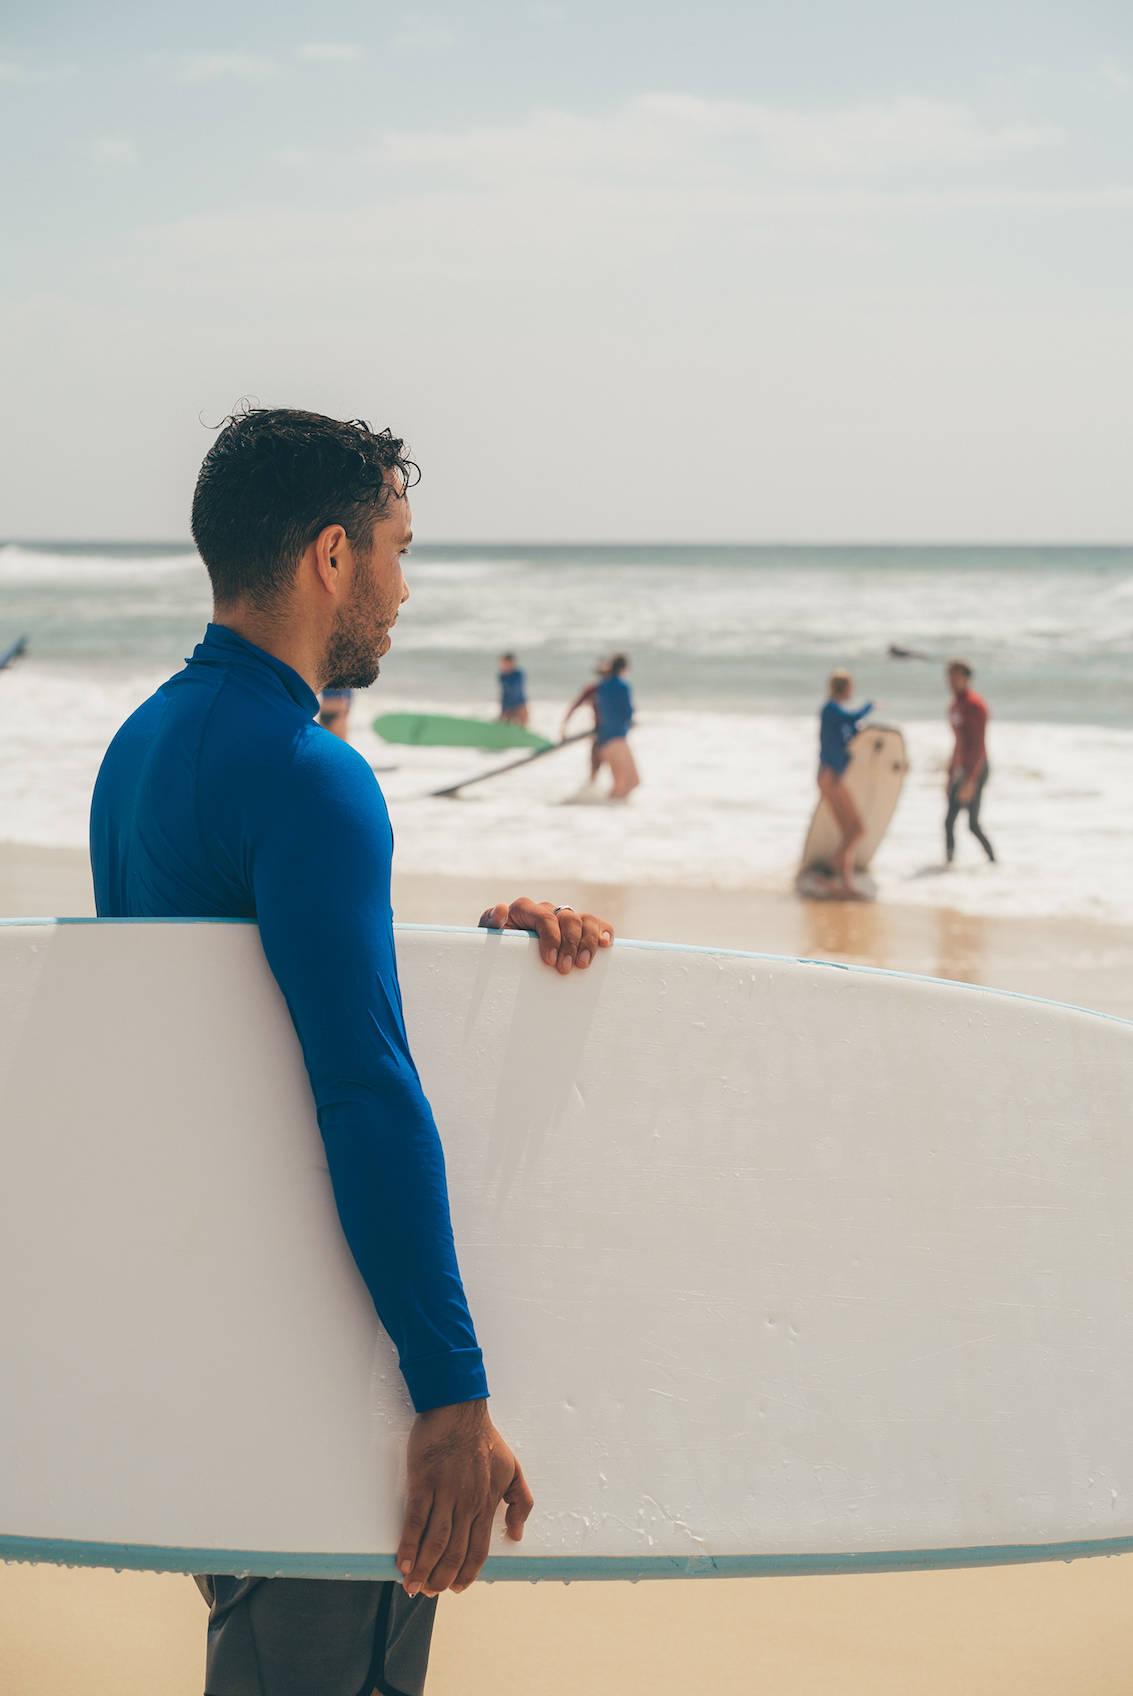 Surfing in Surfers Paradise Australia